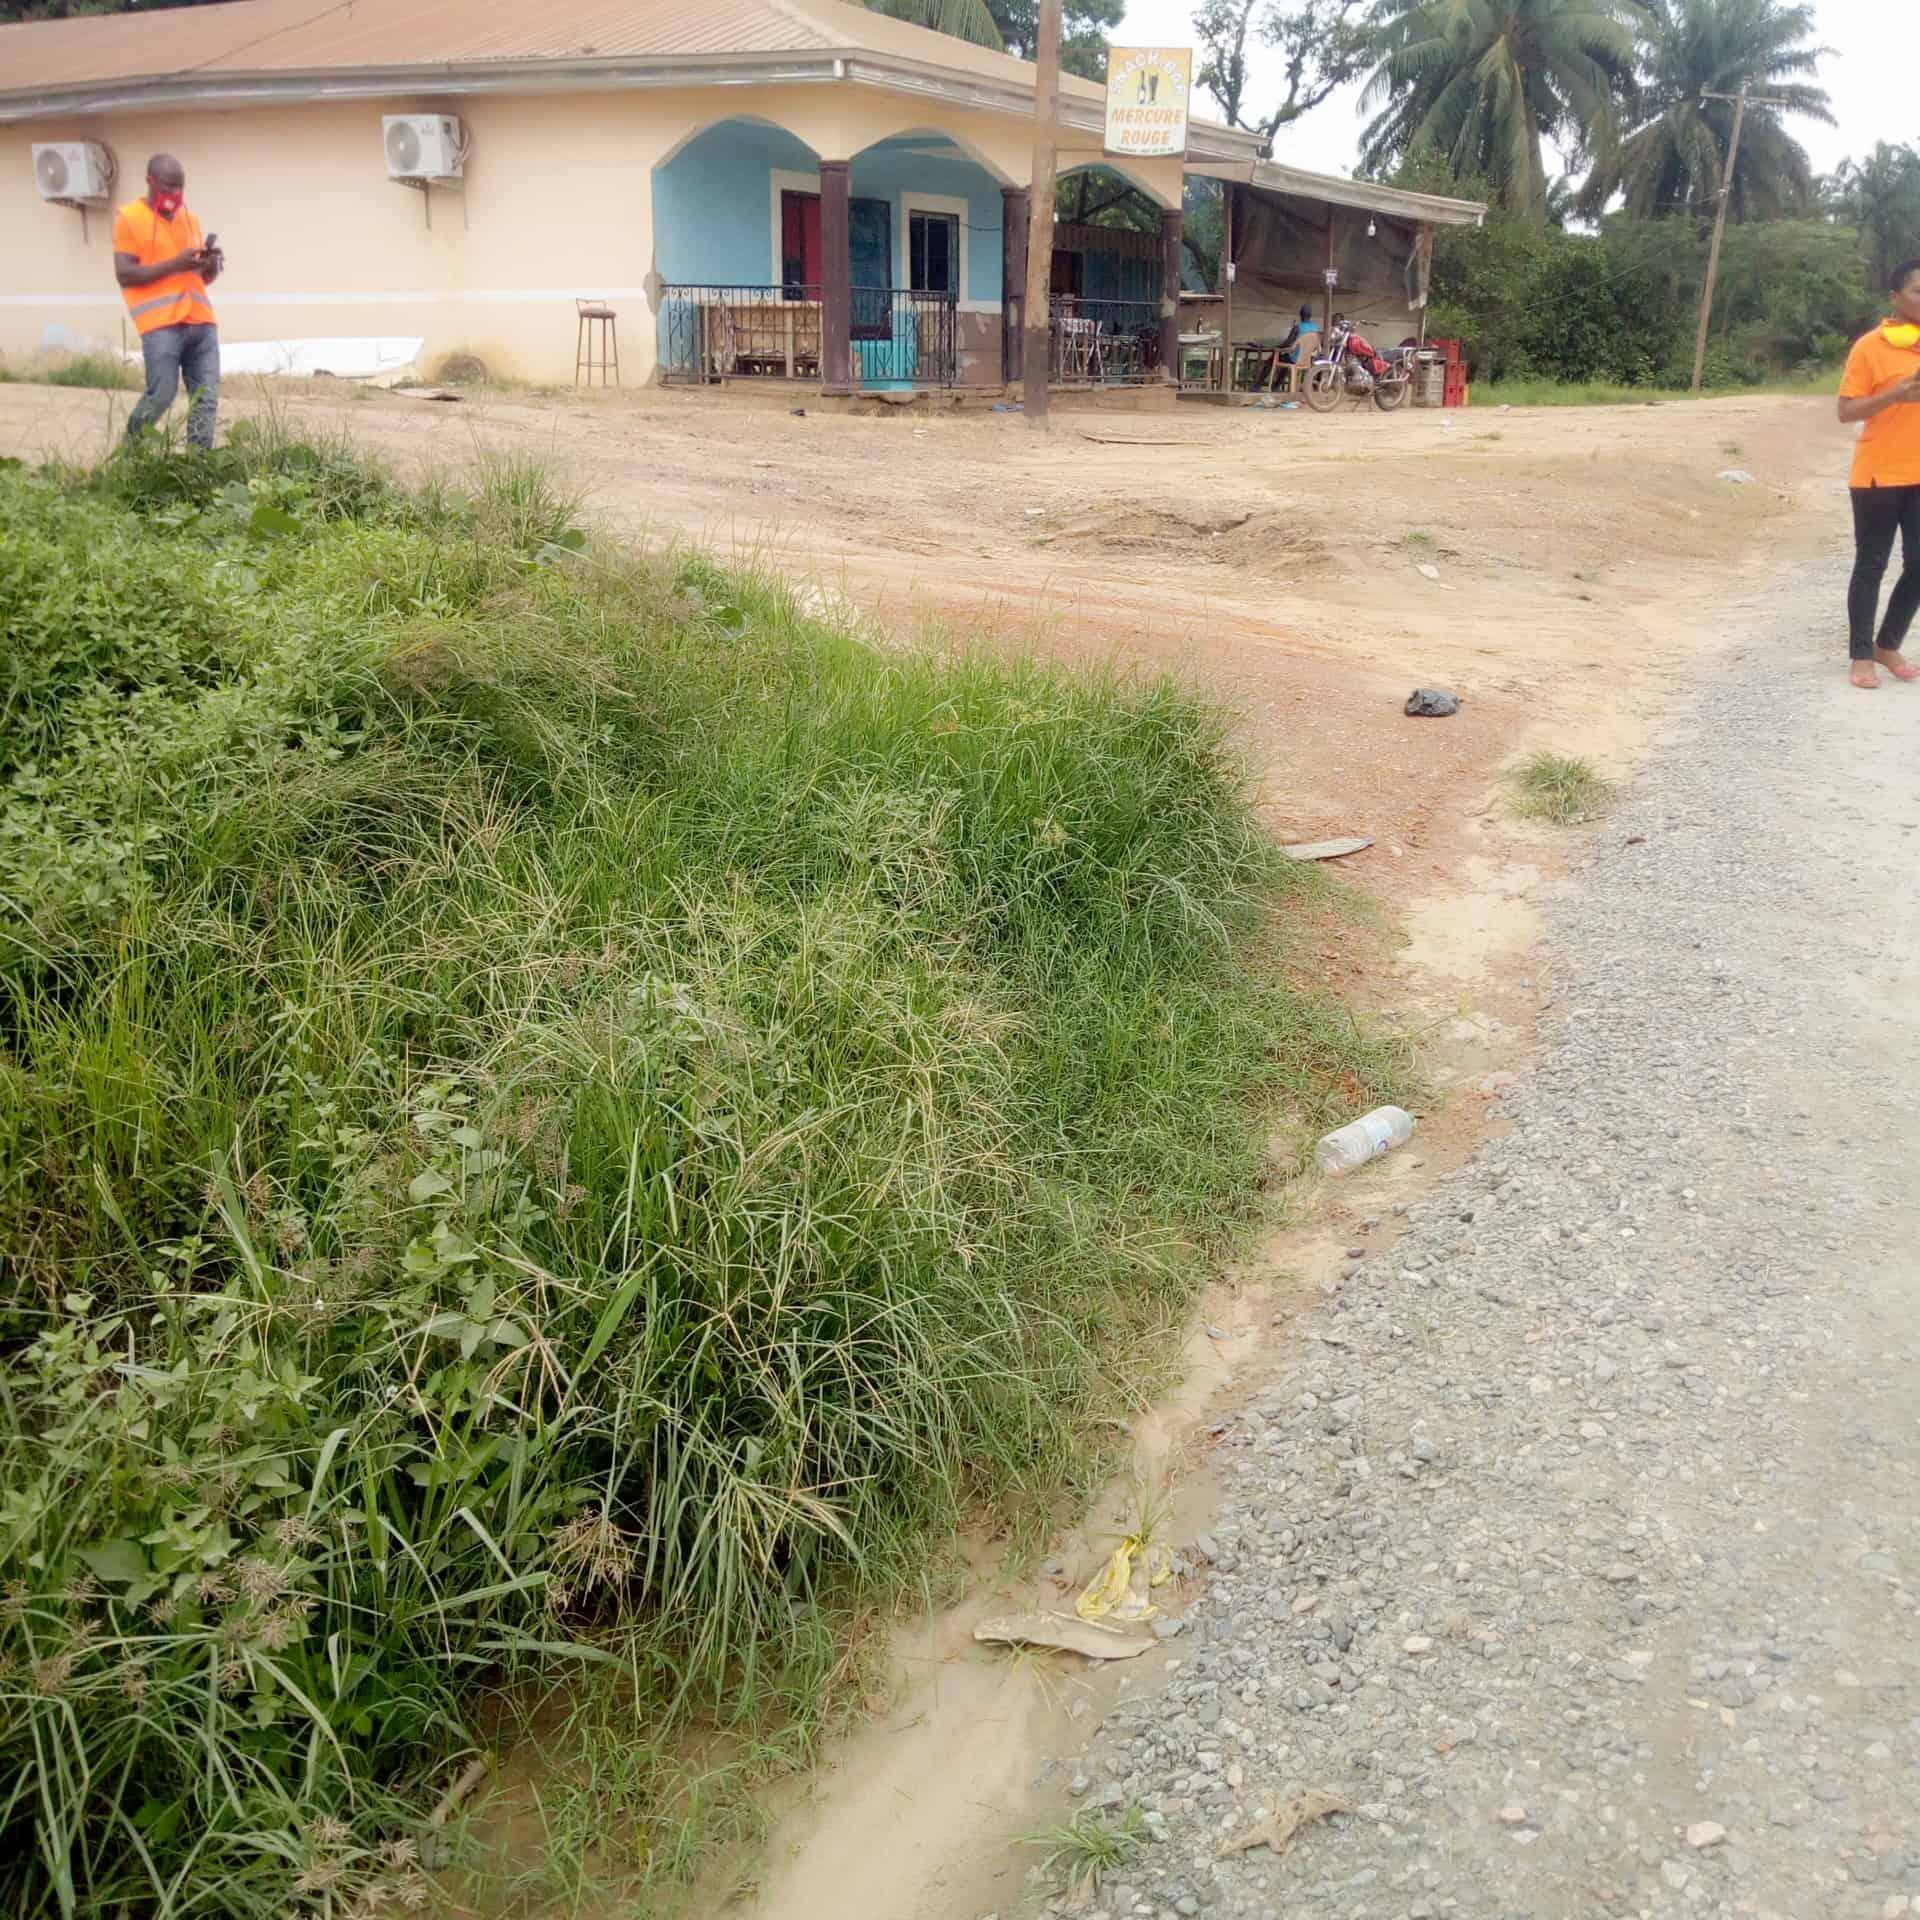 Land for sale at Douala, PK 26, En route - 5000 m2 - 7 000 000 FCFA